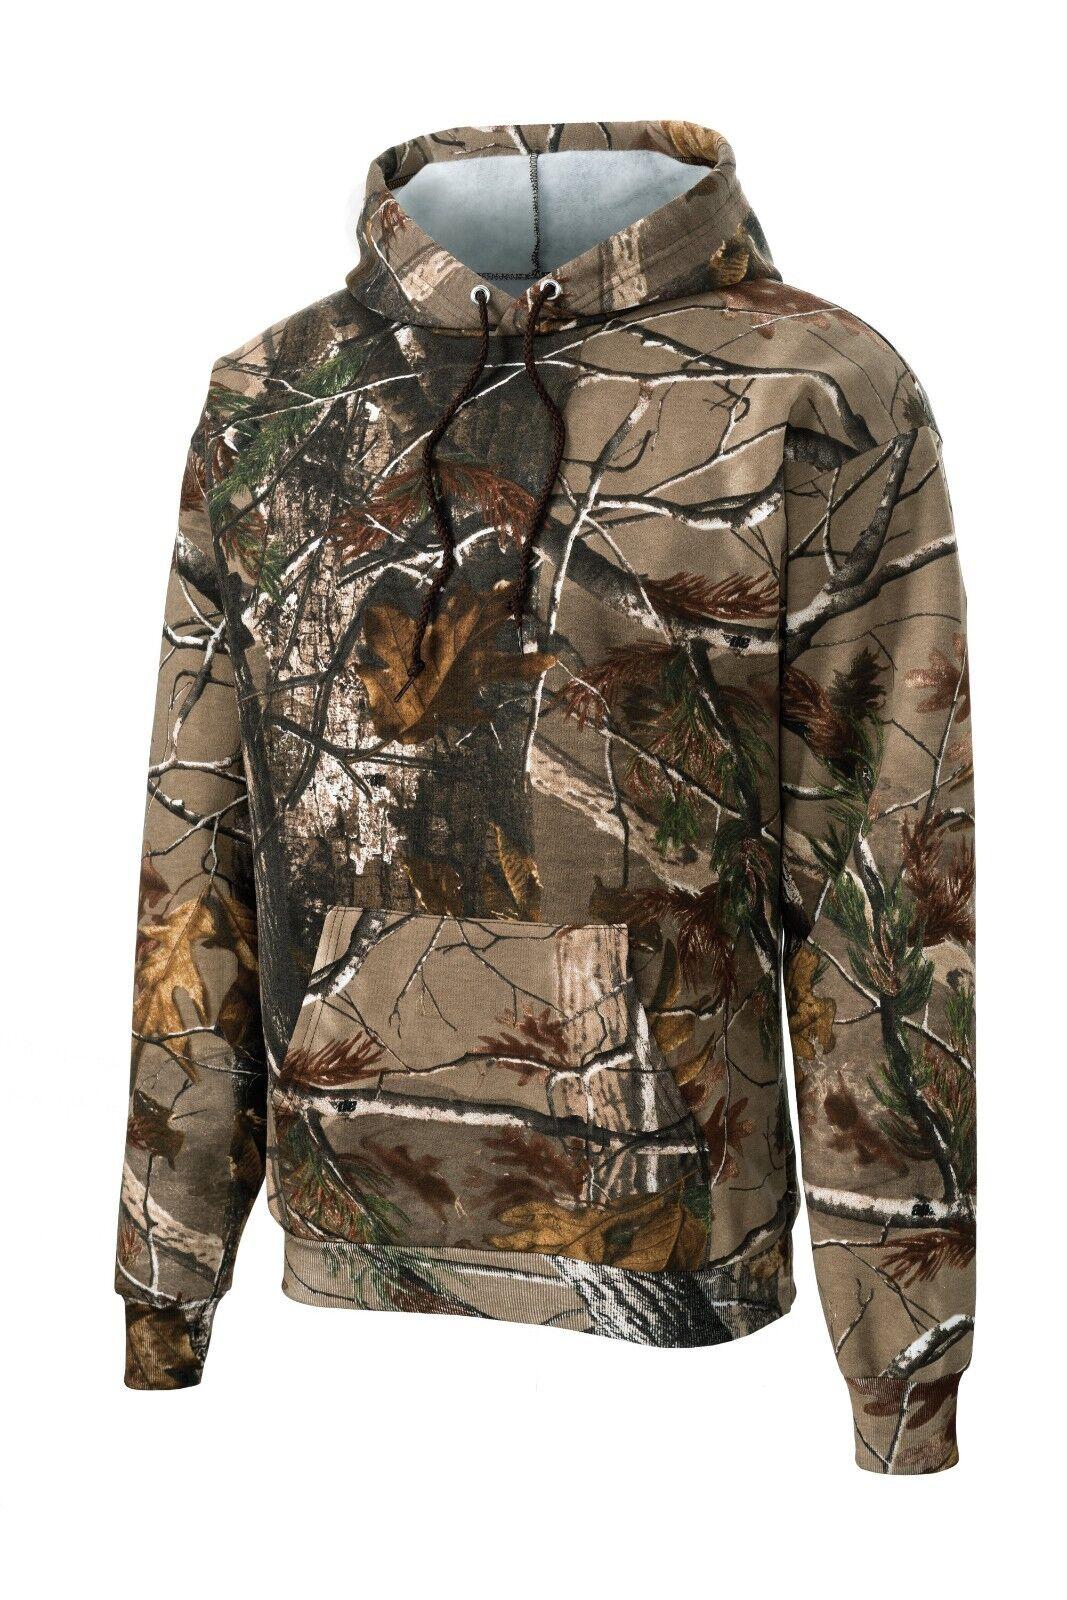 Russell Outdoors Men's AP Sweatshirts Hoody Realtree Crew xtra camo Sport Hooded